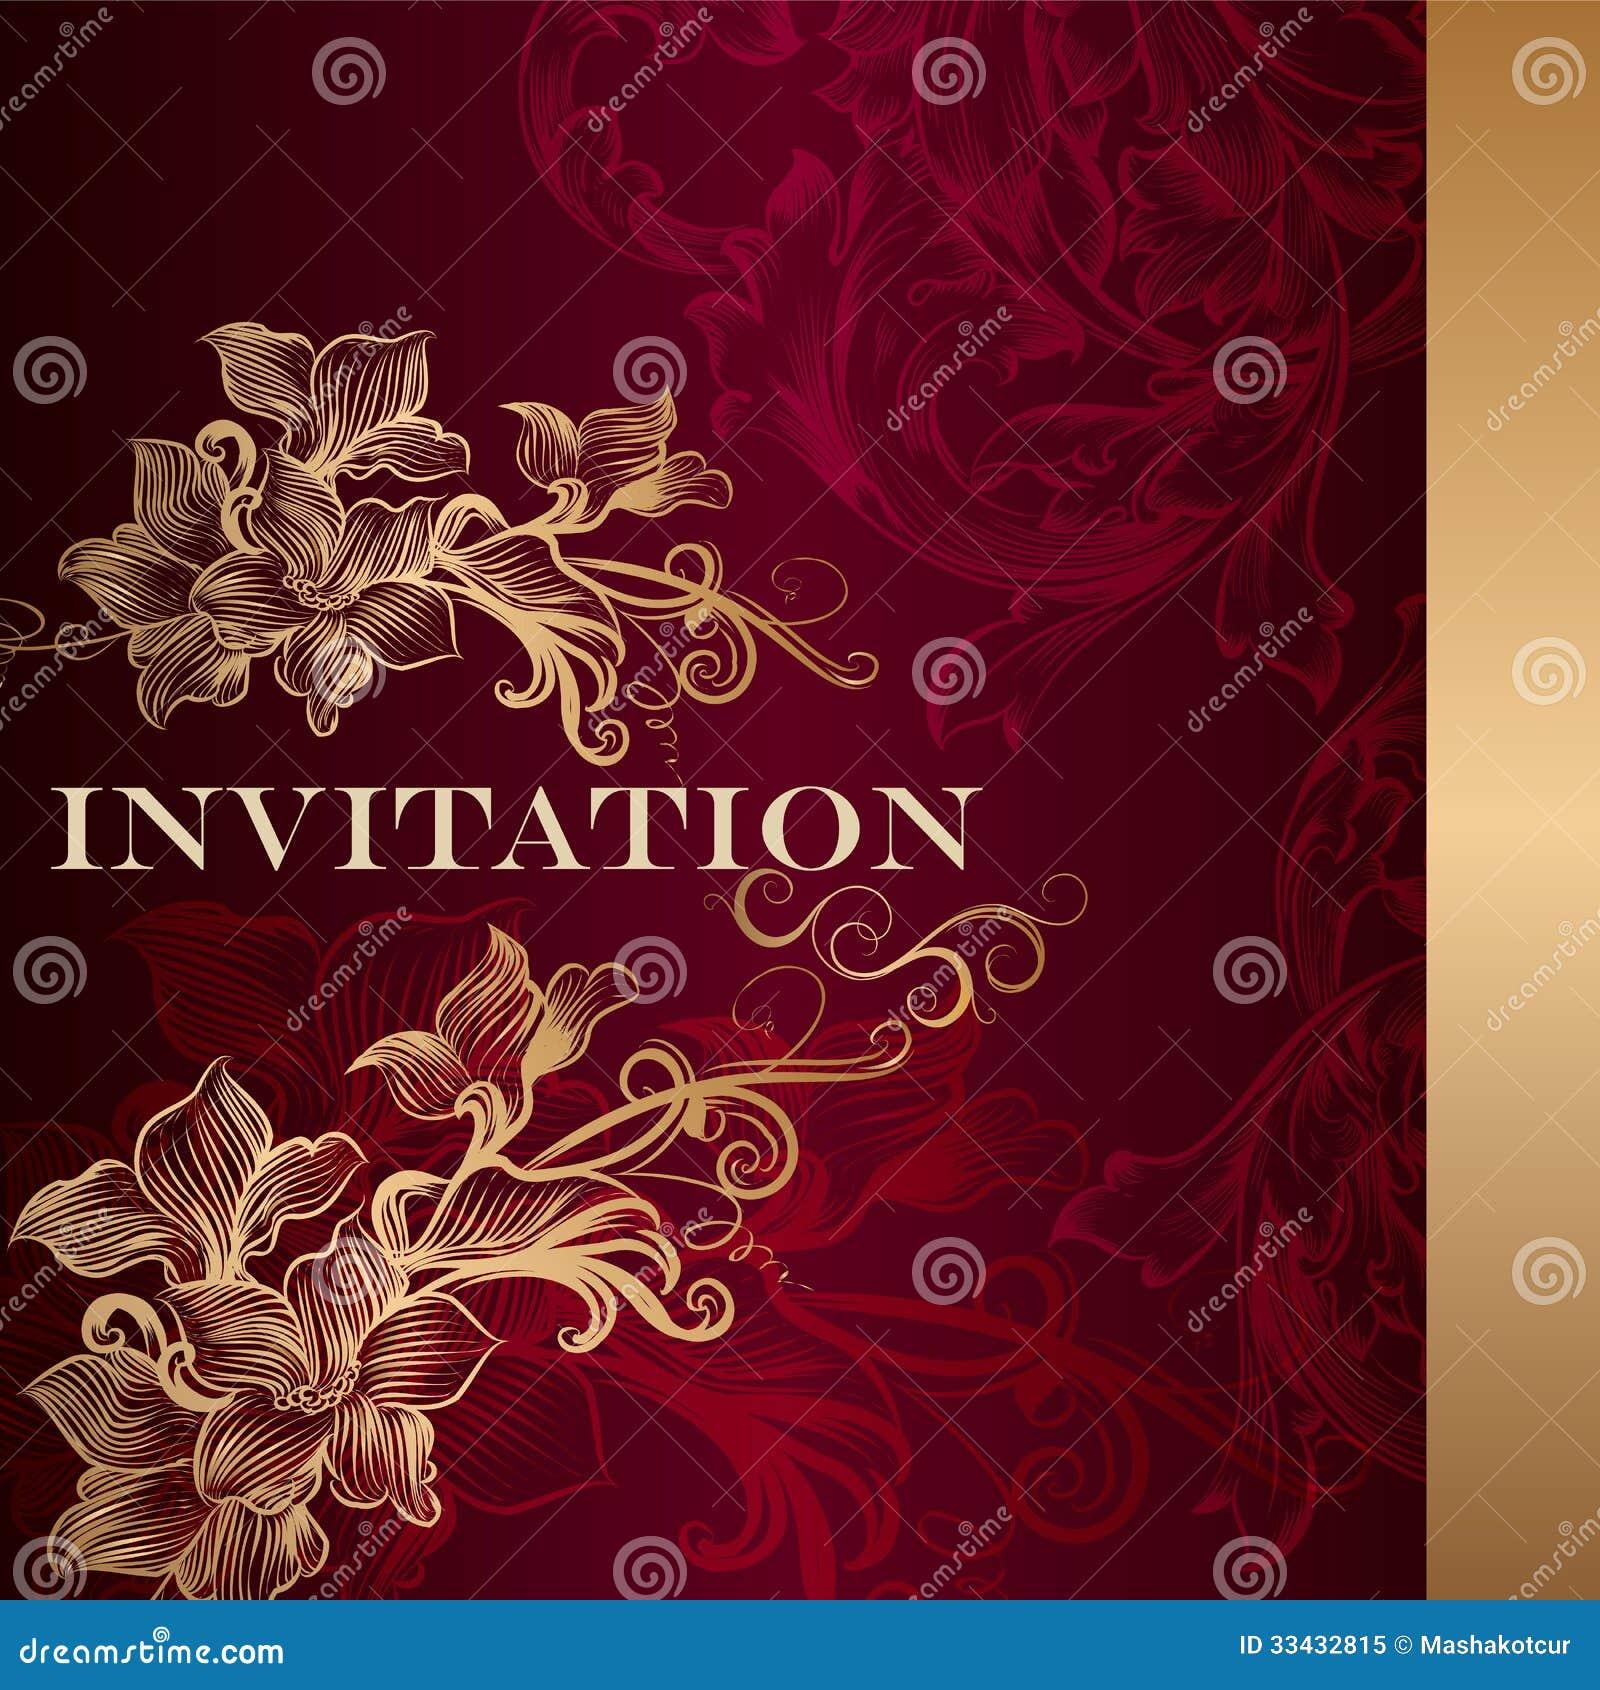 luxury invitation card vintage style elegant classic wedding menu retro vector 33432815 luxury invitation card in vintage style royalty free stock photo,Luxury Invitation Cards